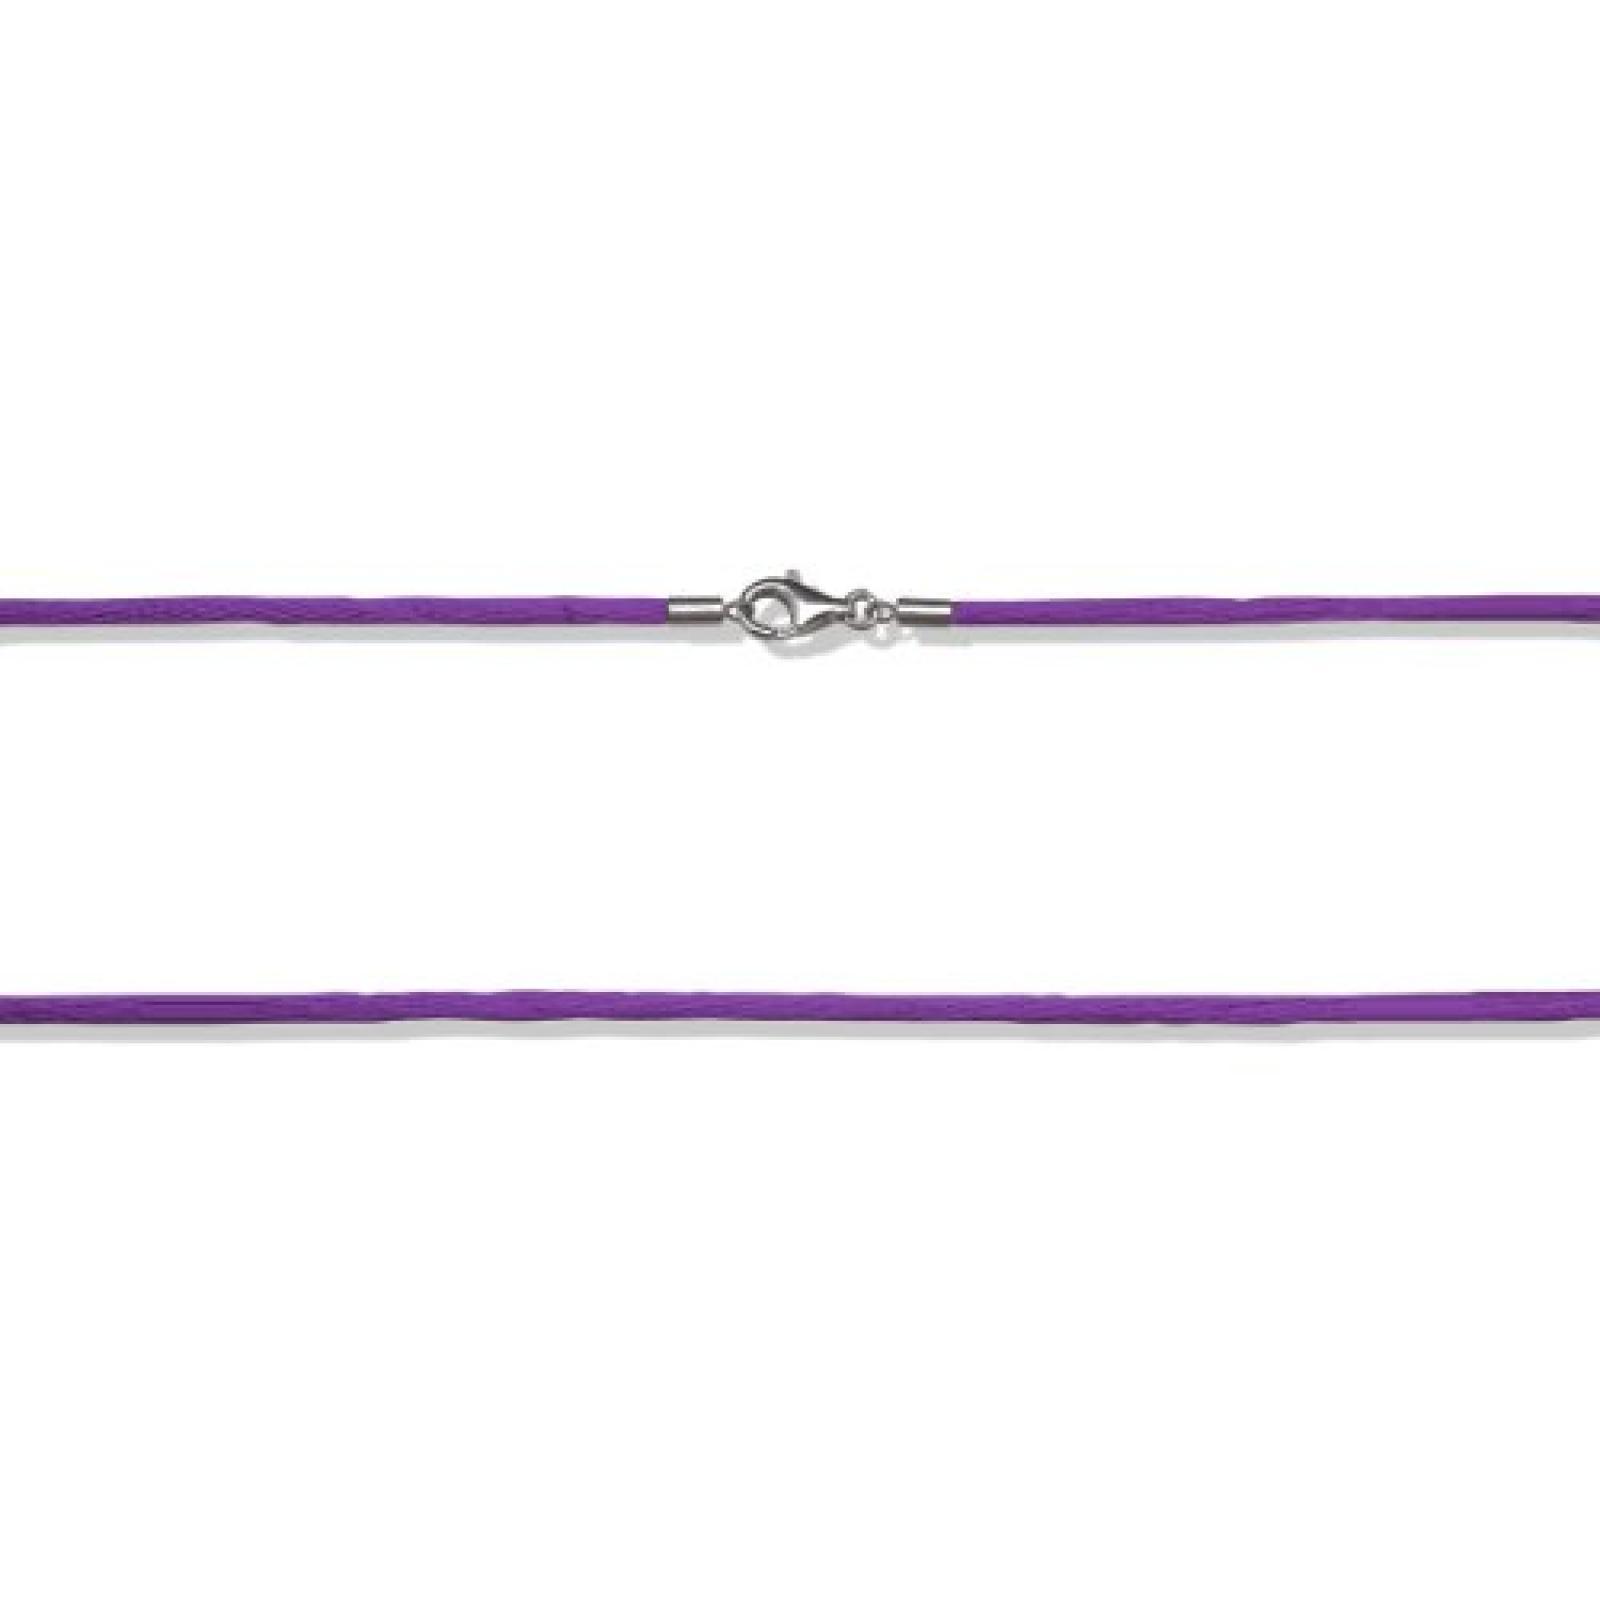 Rafaela Donata  Damen-Halskette Basic Collection Satin lila 925 Sterling Silber 80 cm  60990099